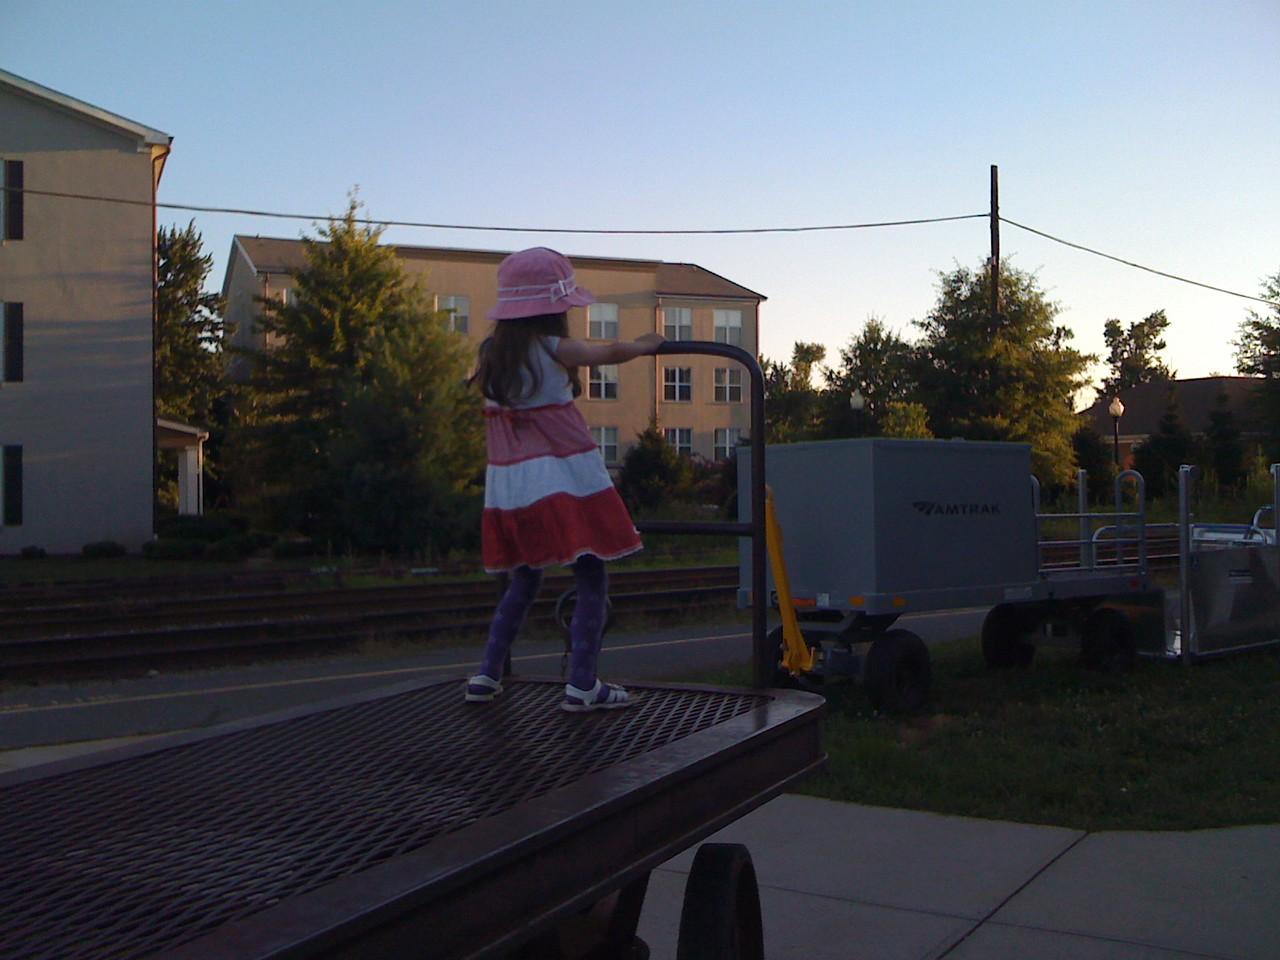 Preparing to Drive the Train